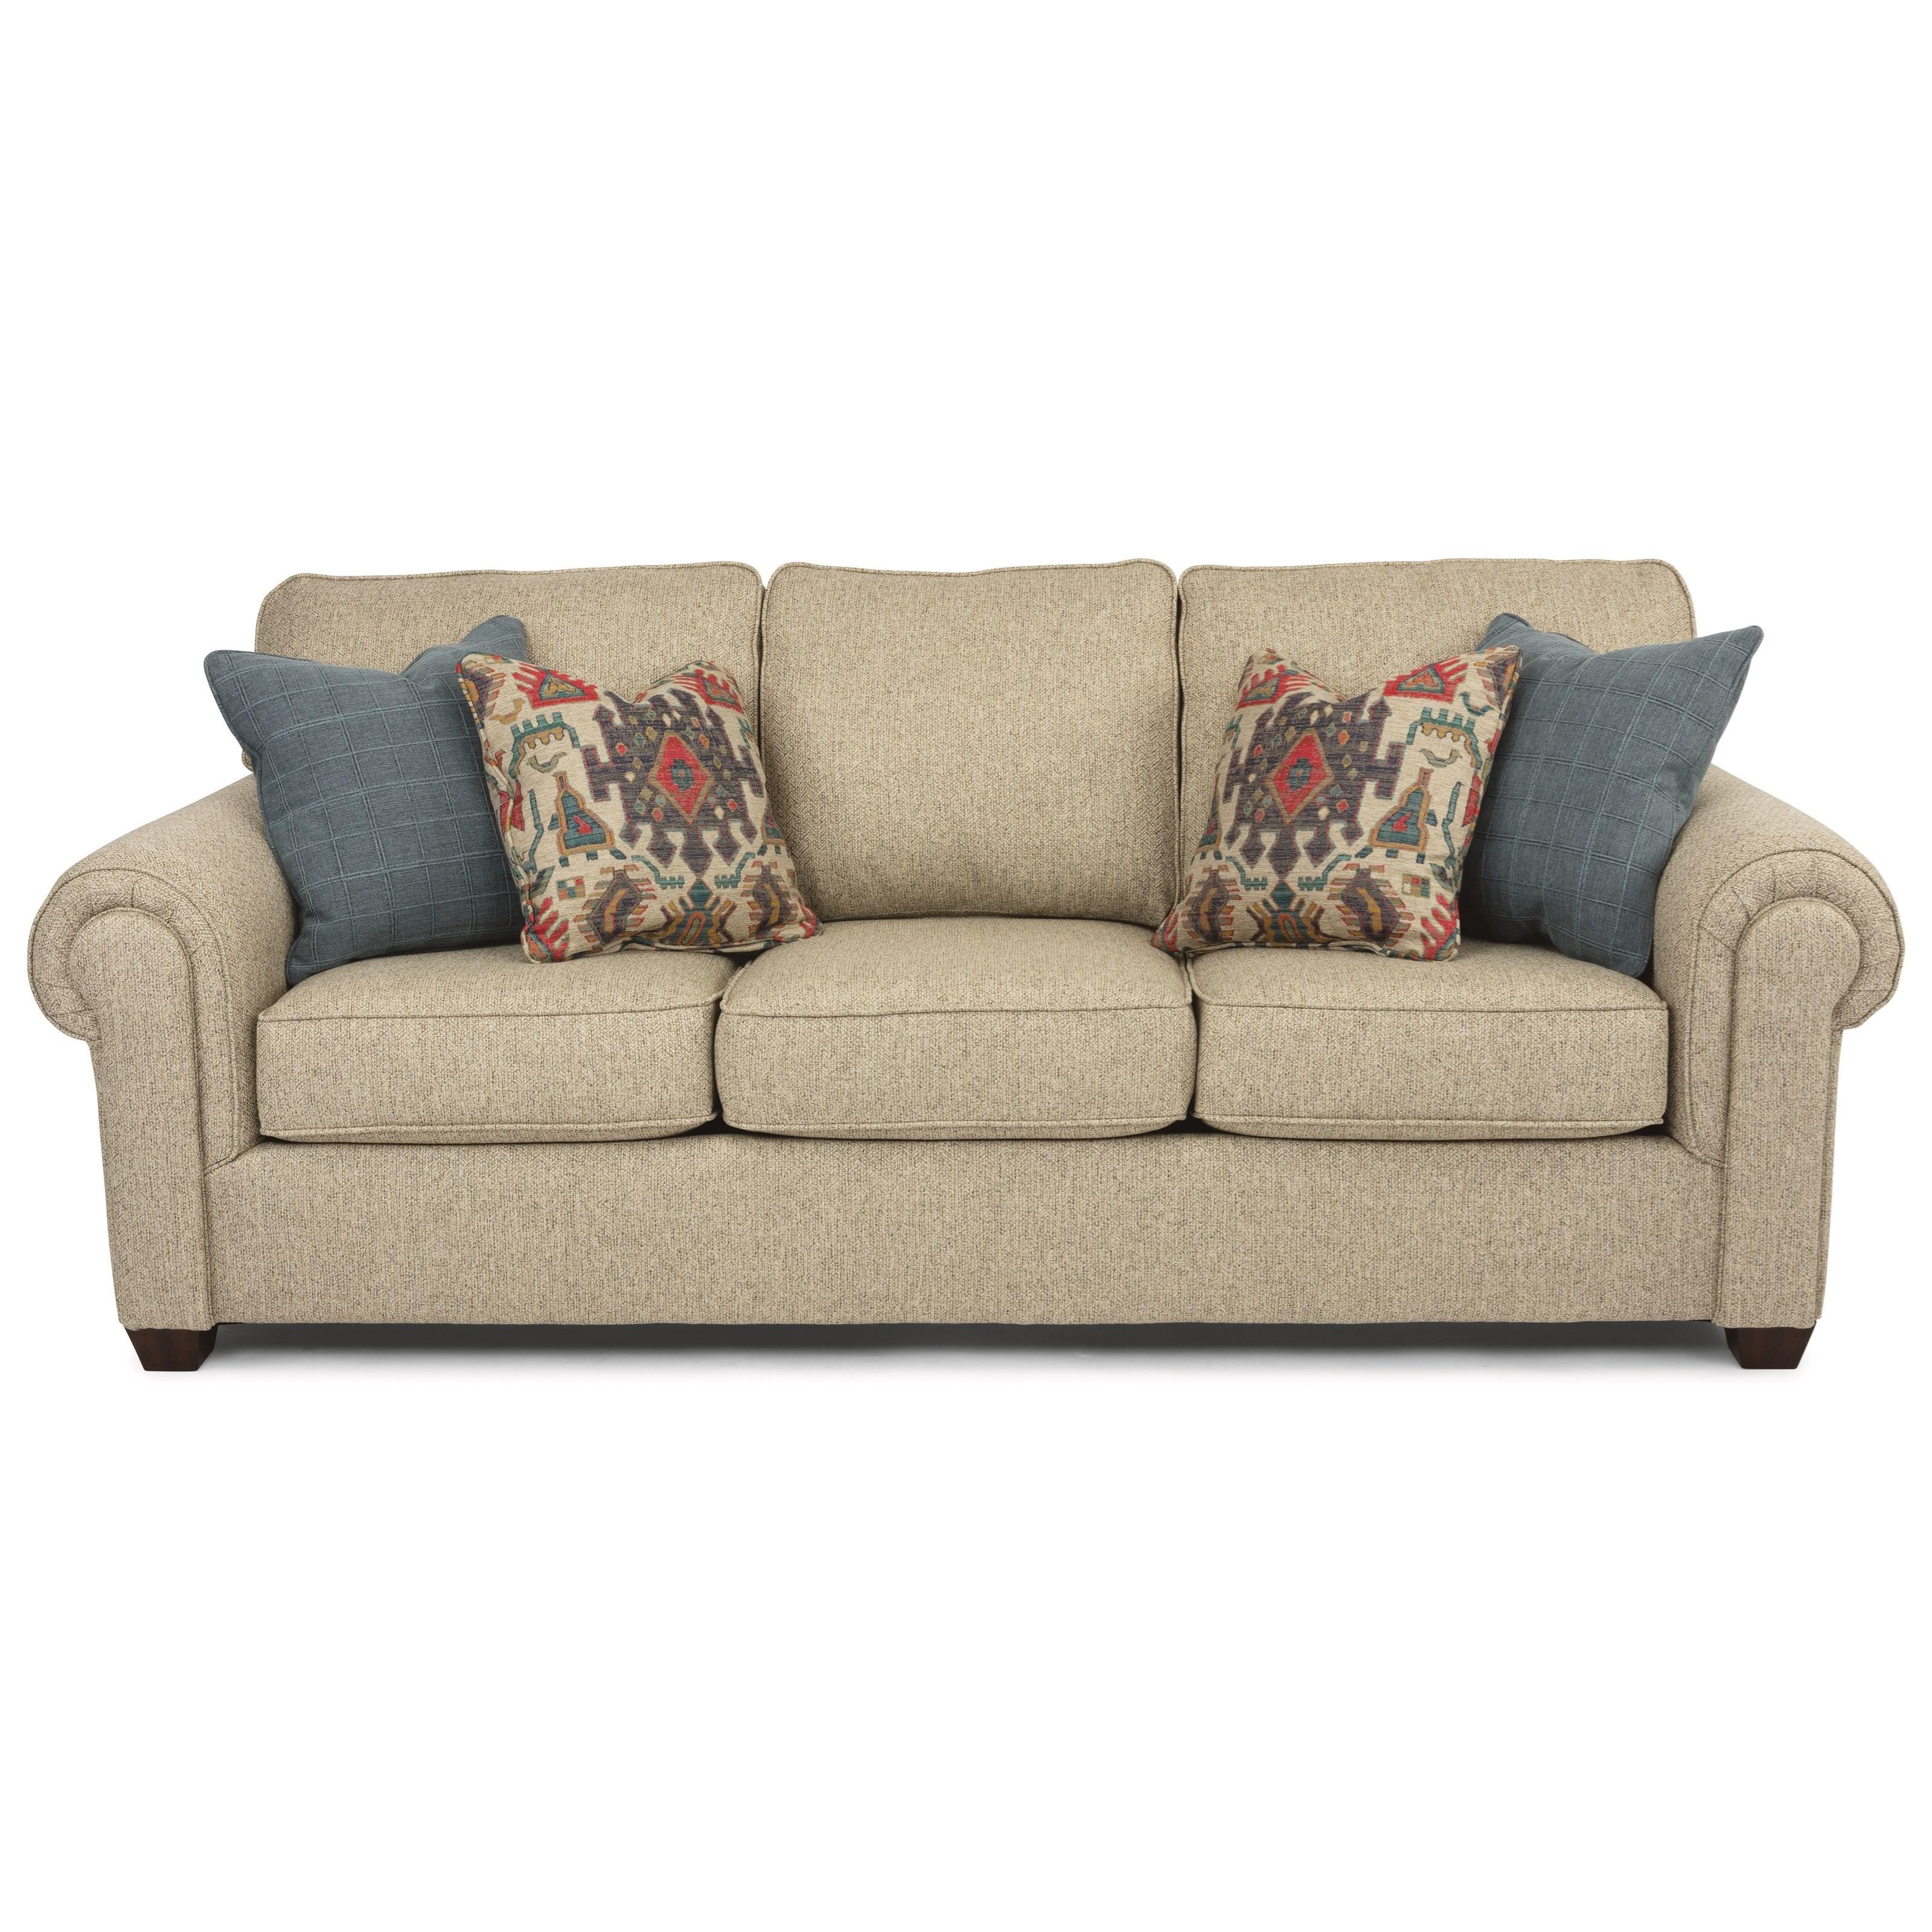 Titan Sofa by Flexsteel at Crowley Furniture & Mattress